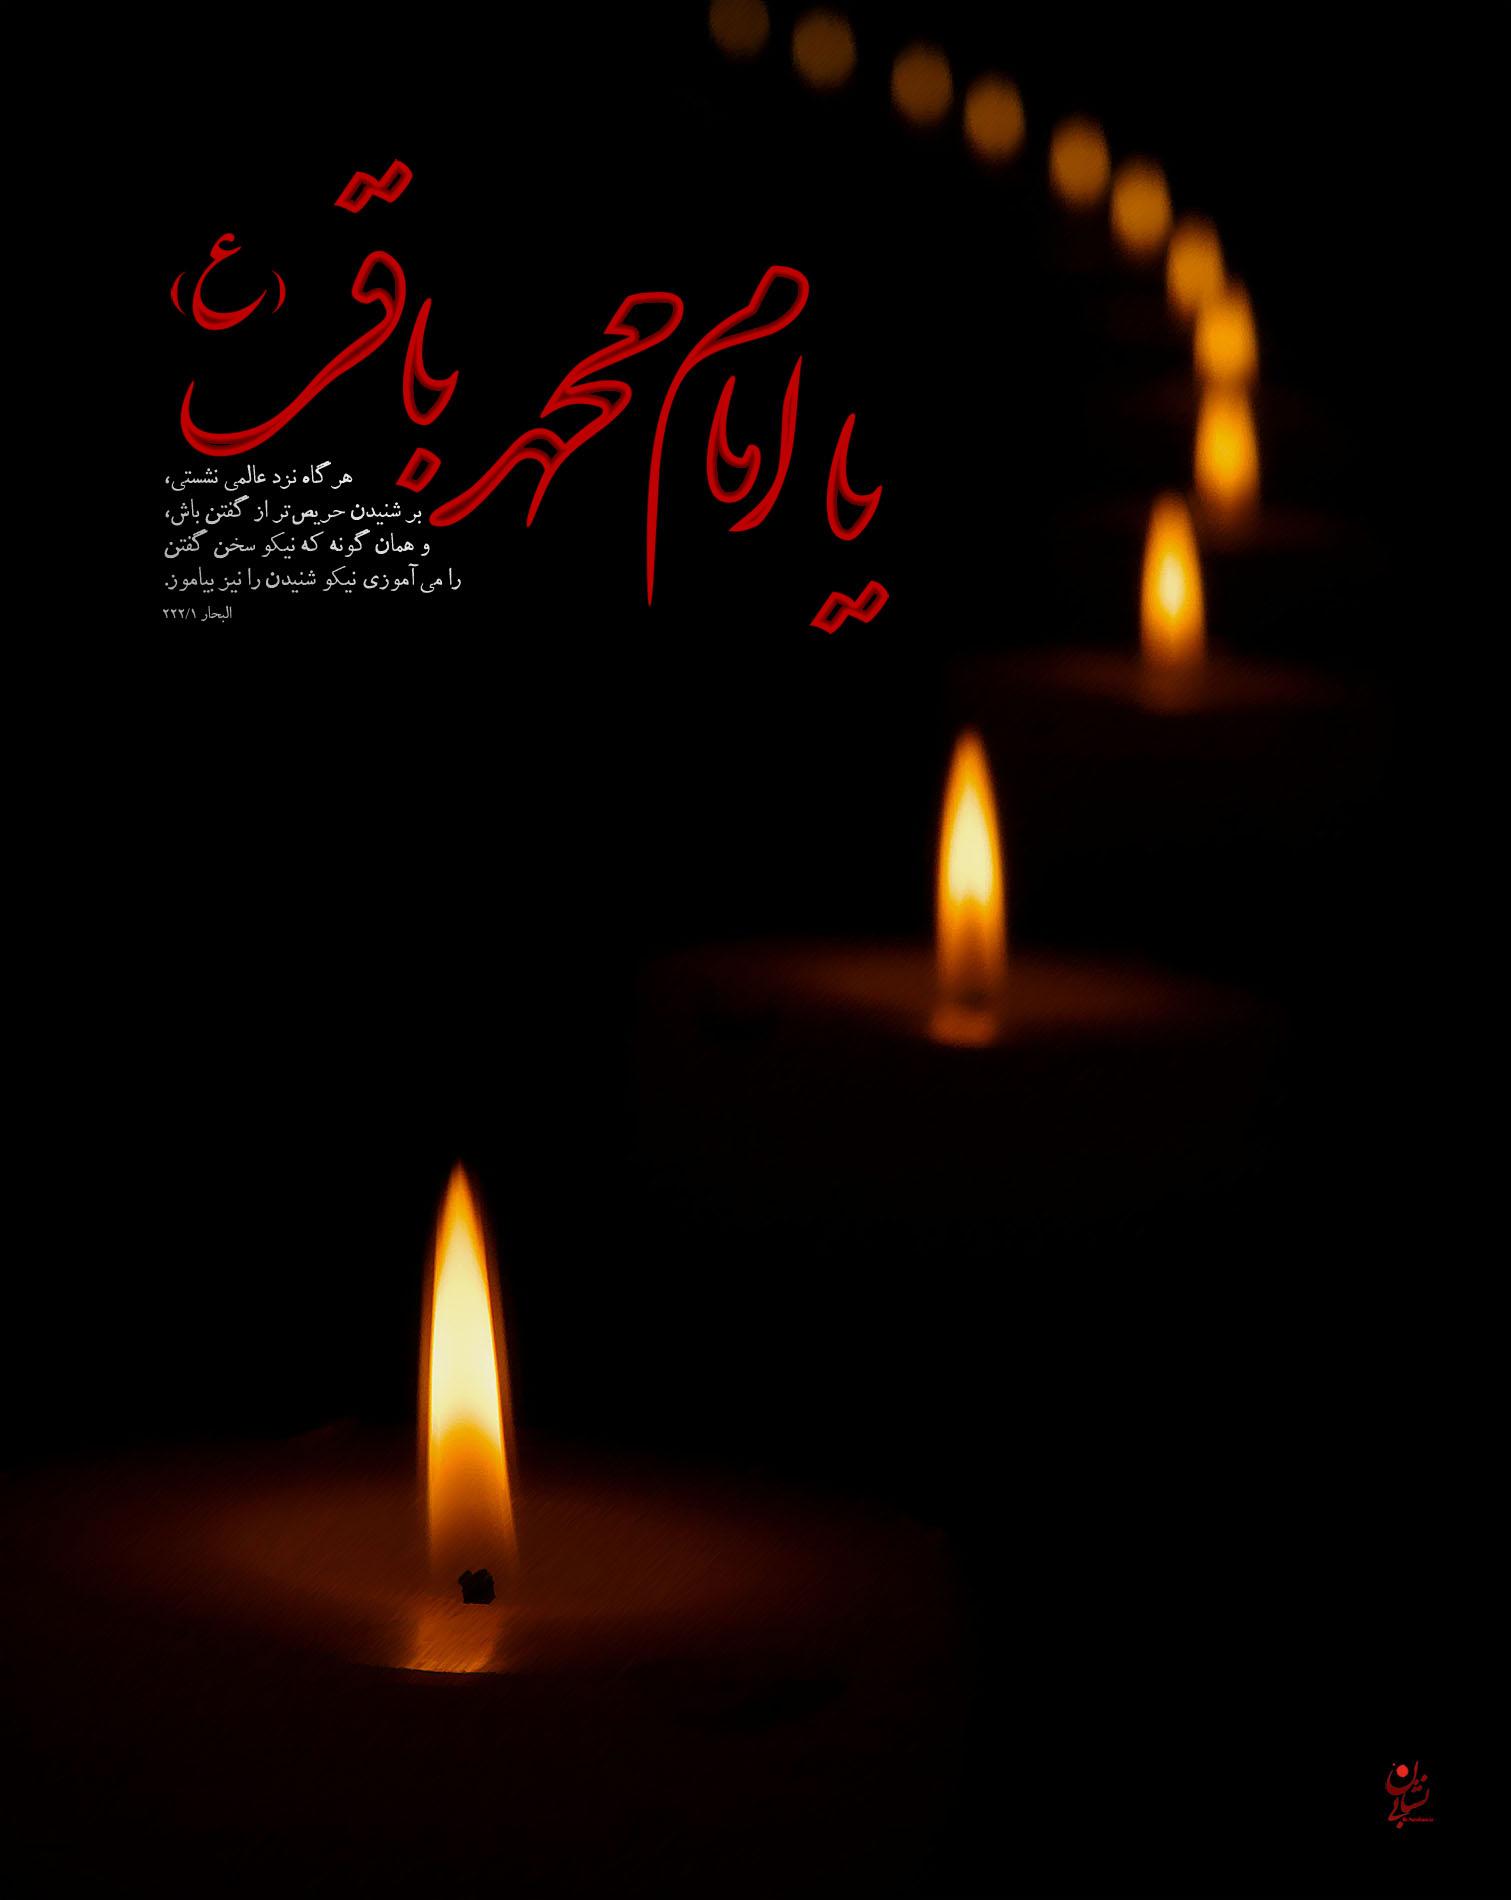 امام باقر(ع)---شلمچه سرزمین عشق وایثار